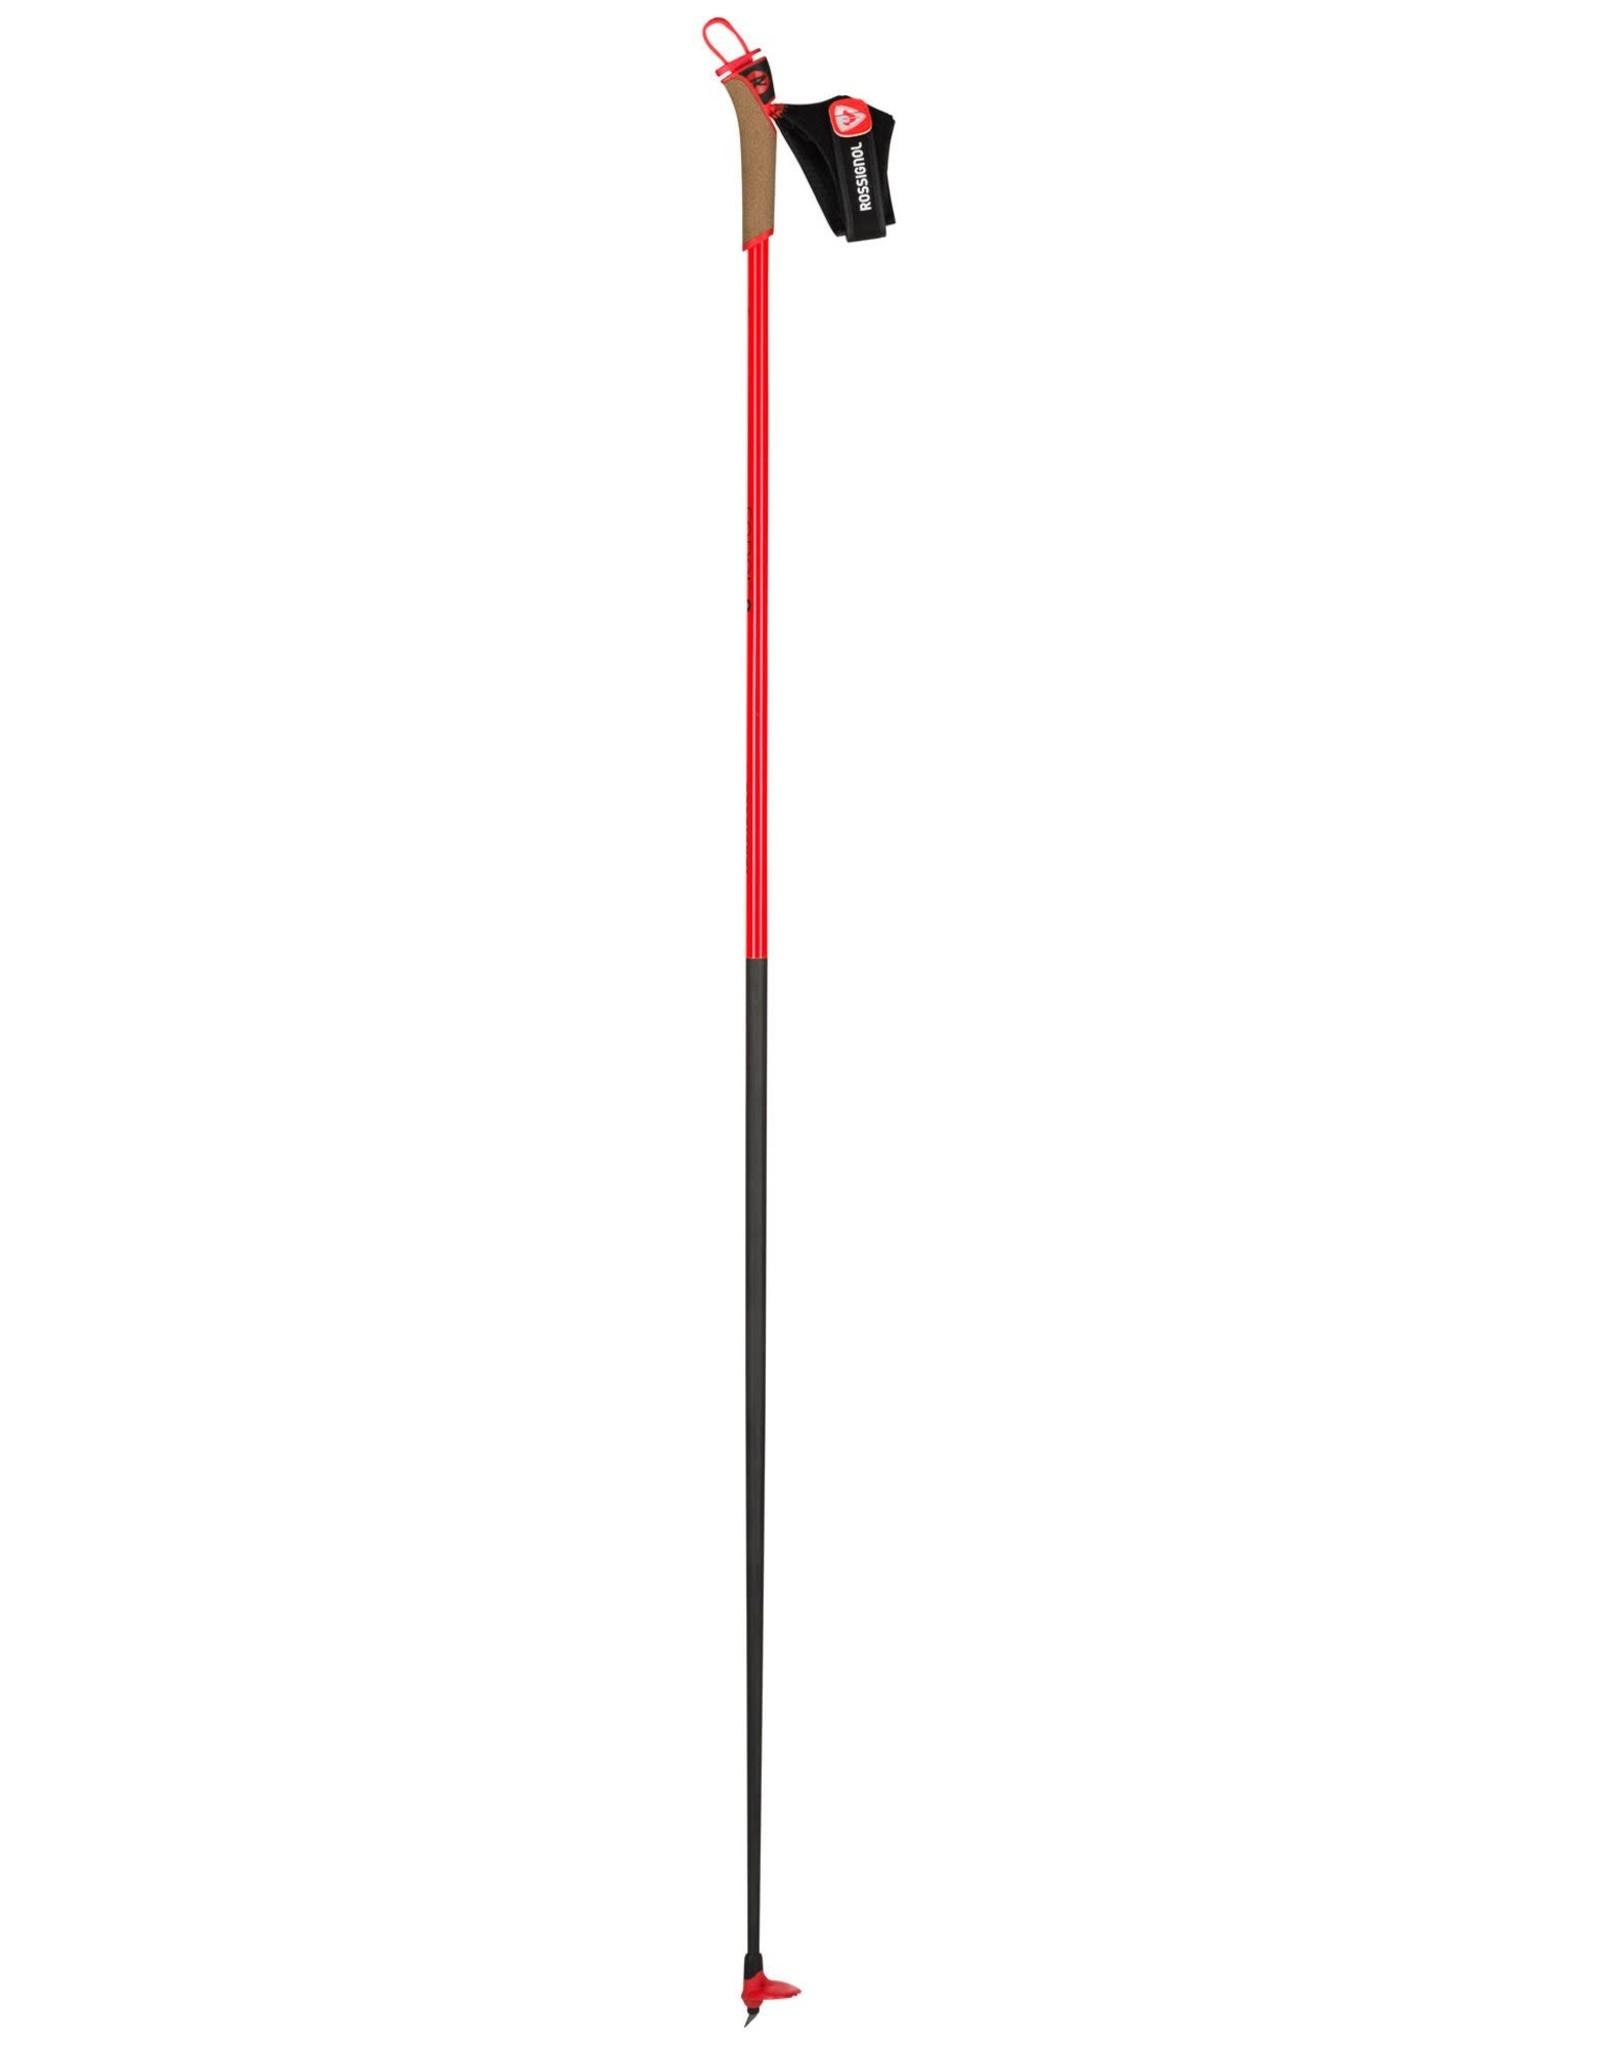 ROSSIGNOL CANADA '21, ROSSIGNOL, Force 9 Pole